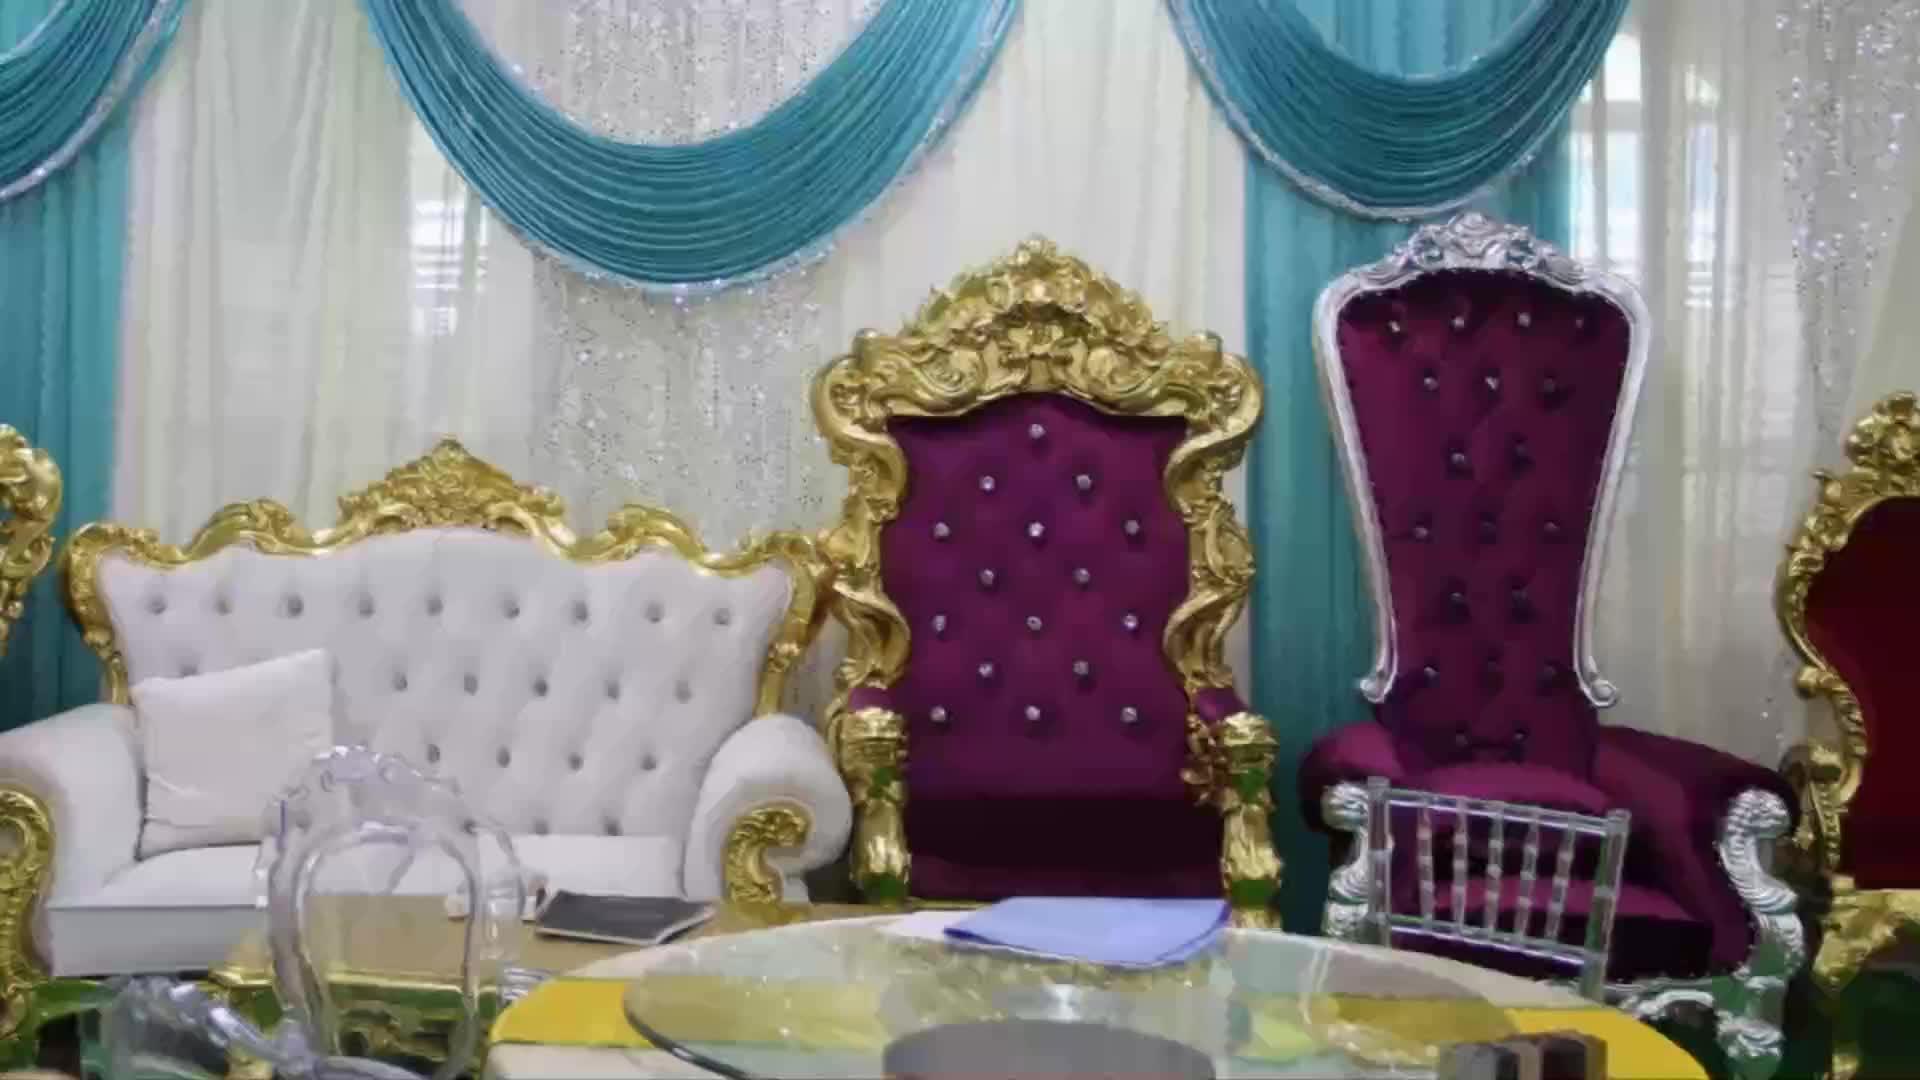 2017 Venta caliente boda utilizado sillas Chiavari